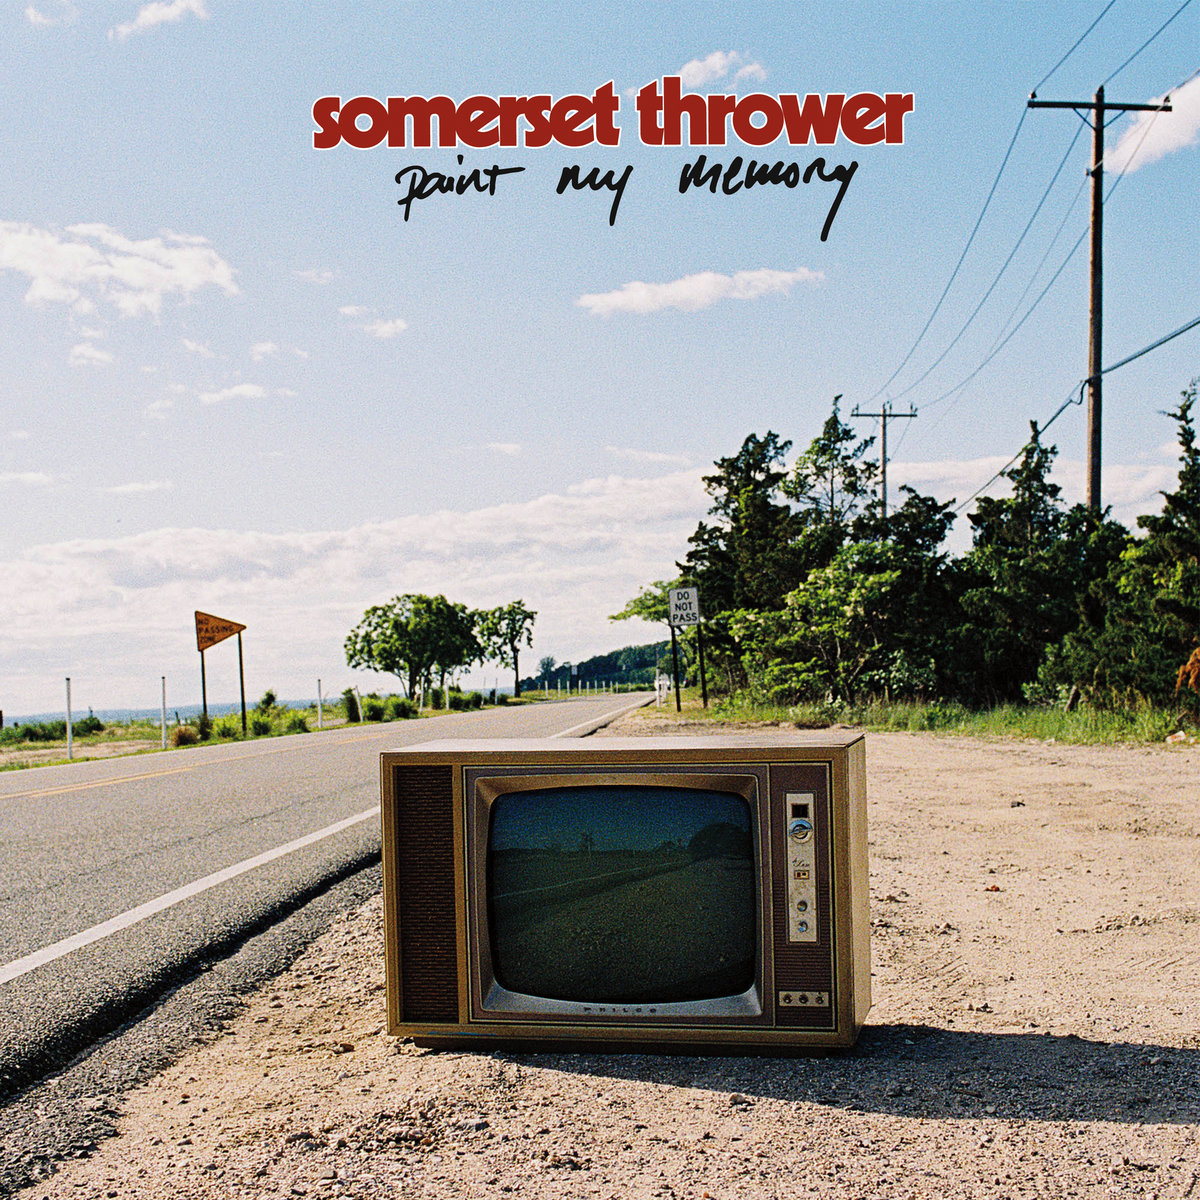 Somerset Thrower - Paint My Memory LP - Triple-B Records / Dead Broke Rekerdz